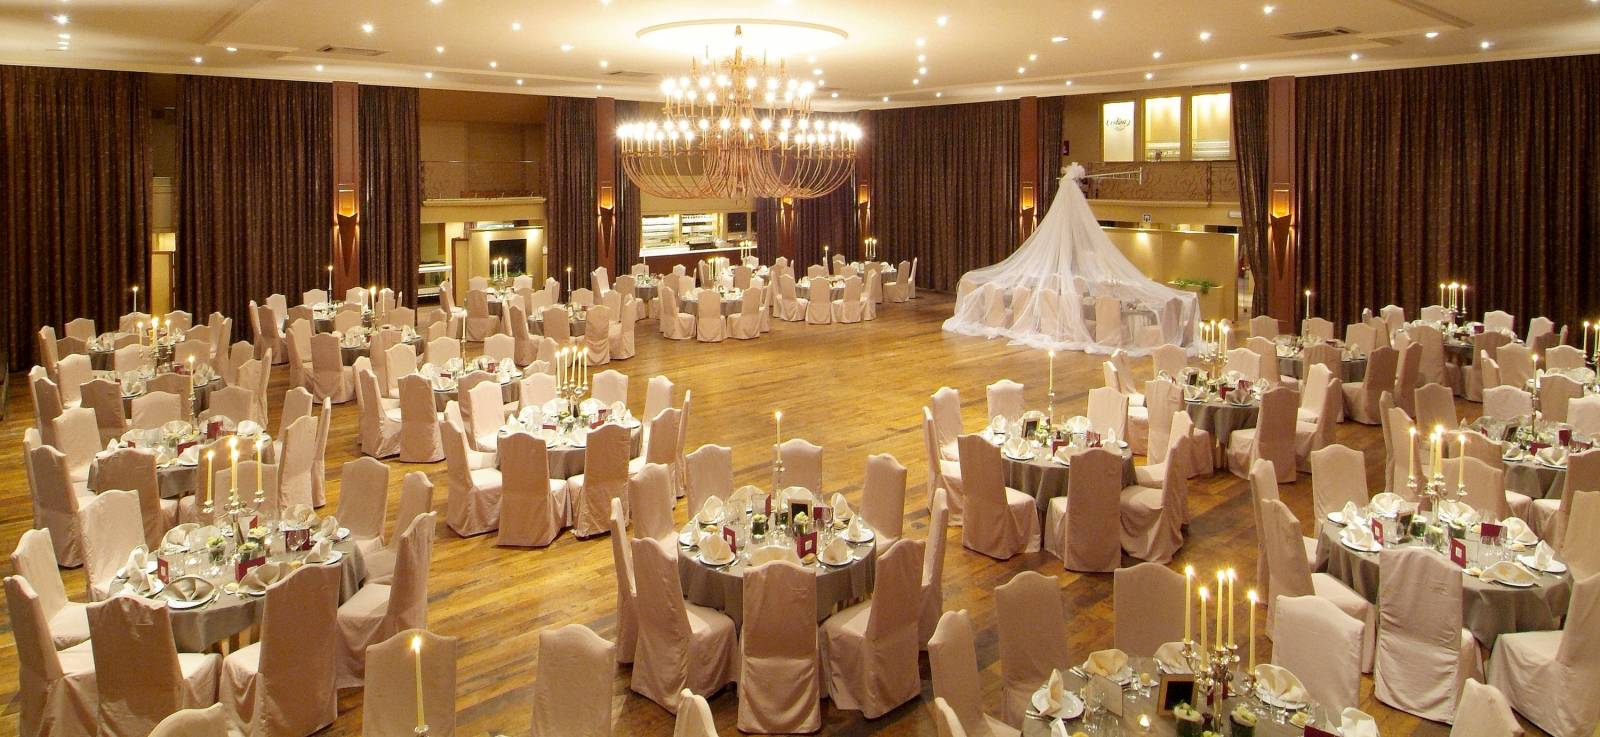 Cortina Wevelgem - Feestzaal - House of Weddings (5)